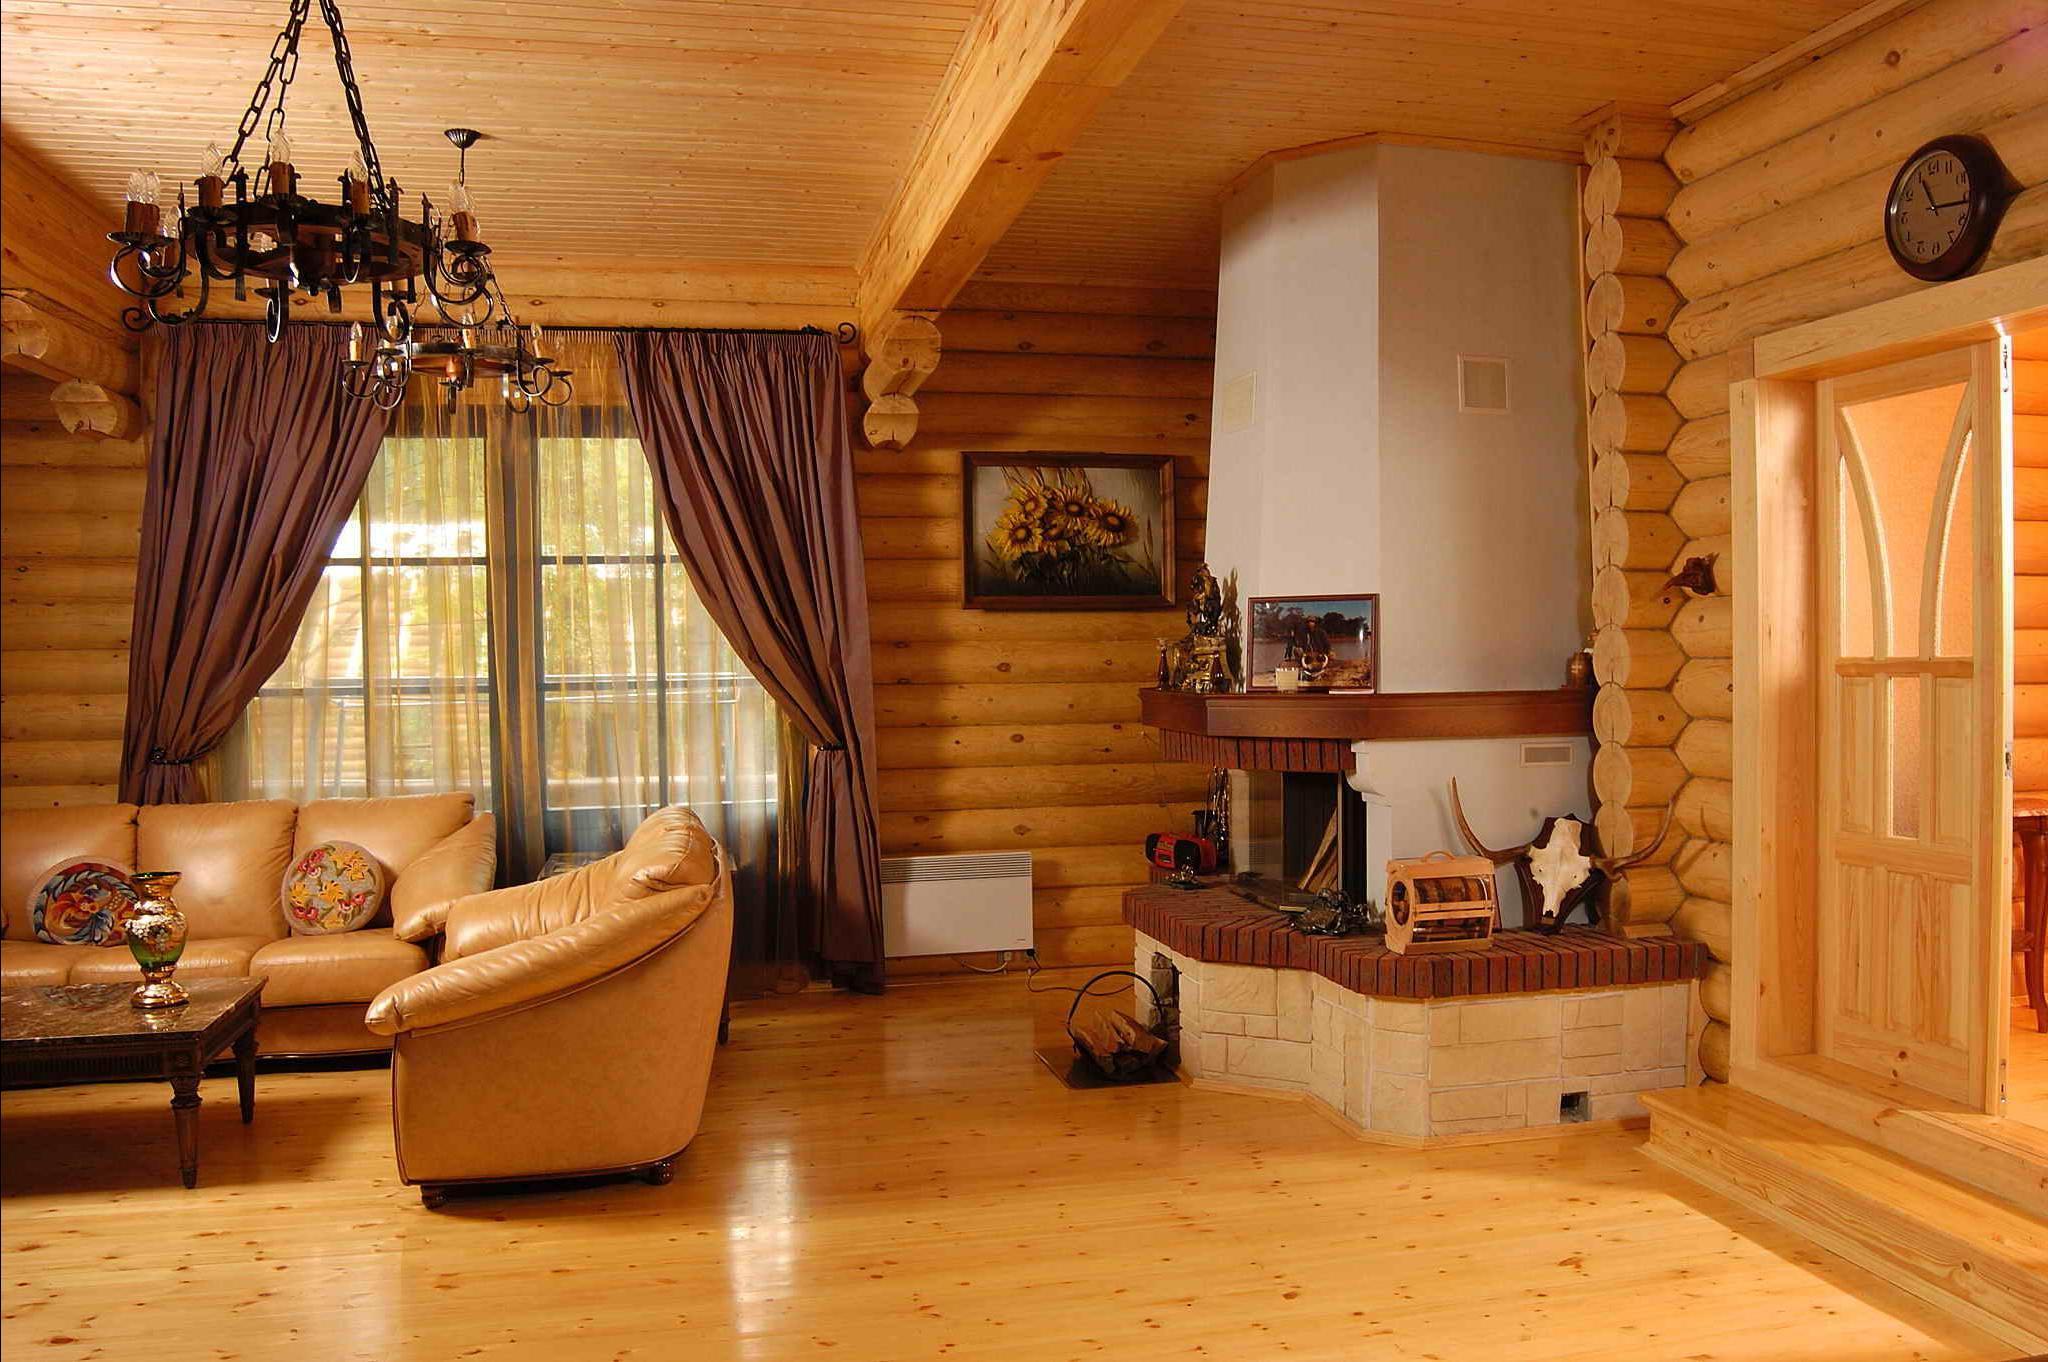 Дизайн оцилиндрованного дома внутри